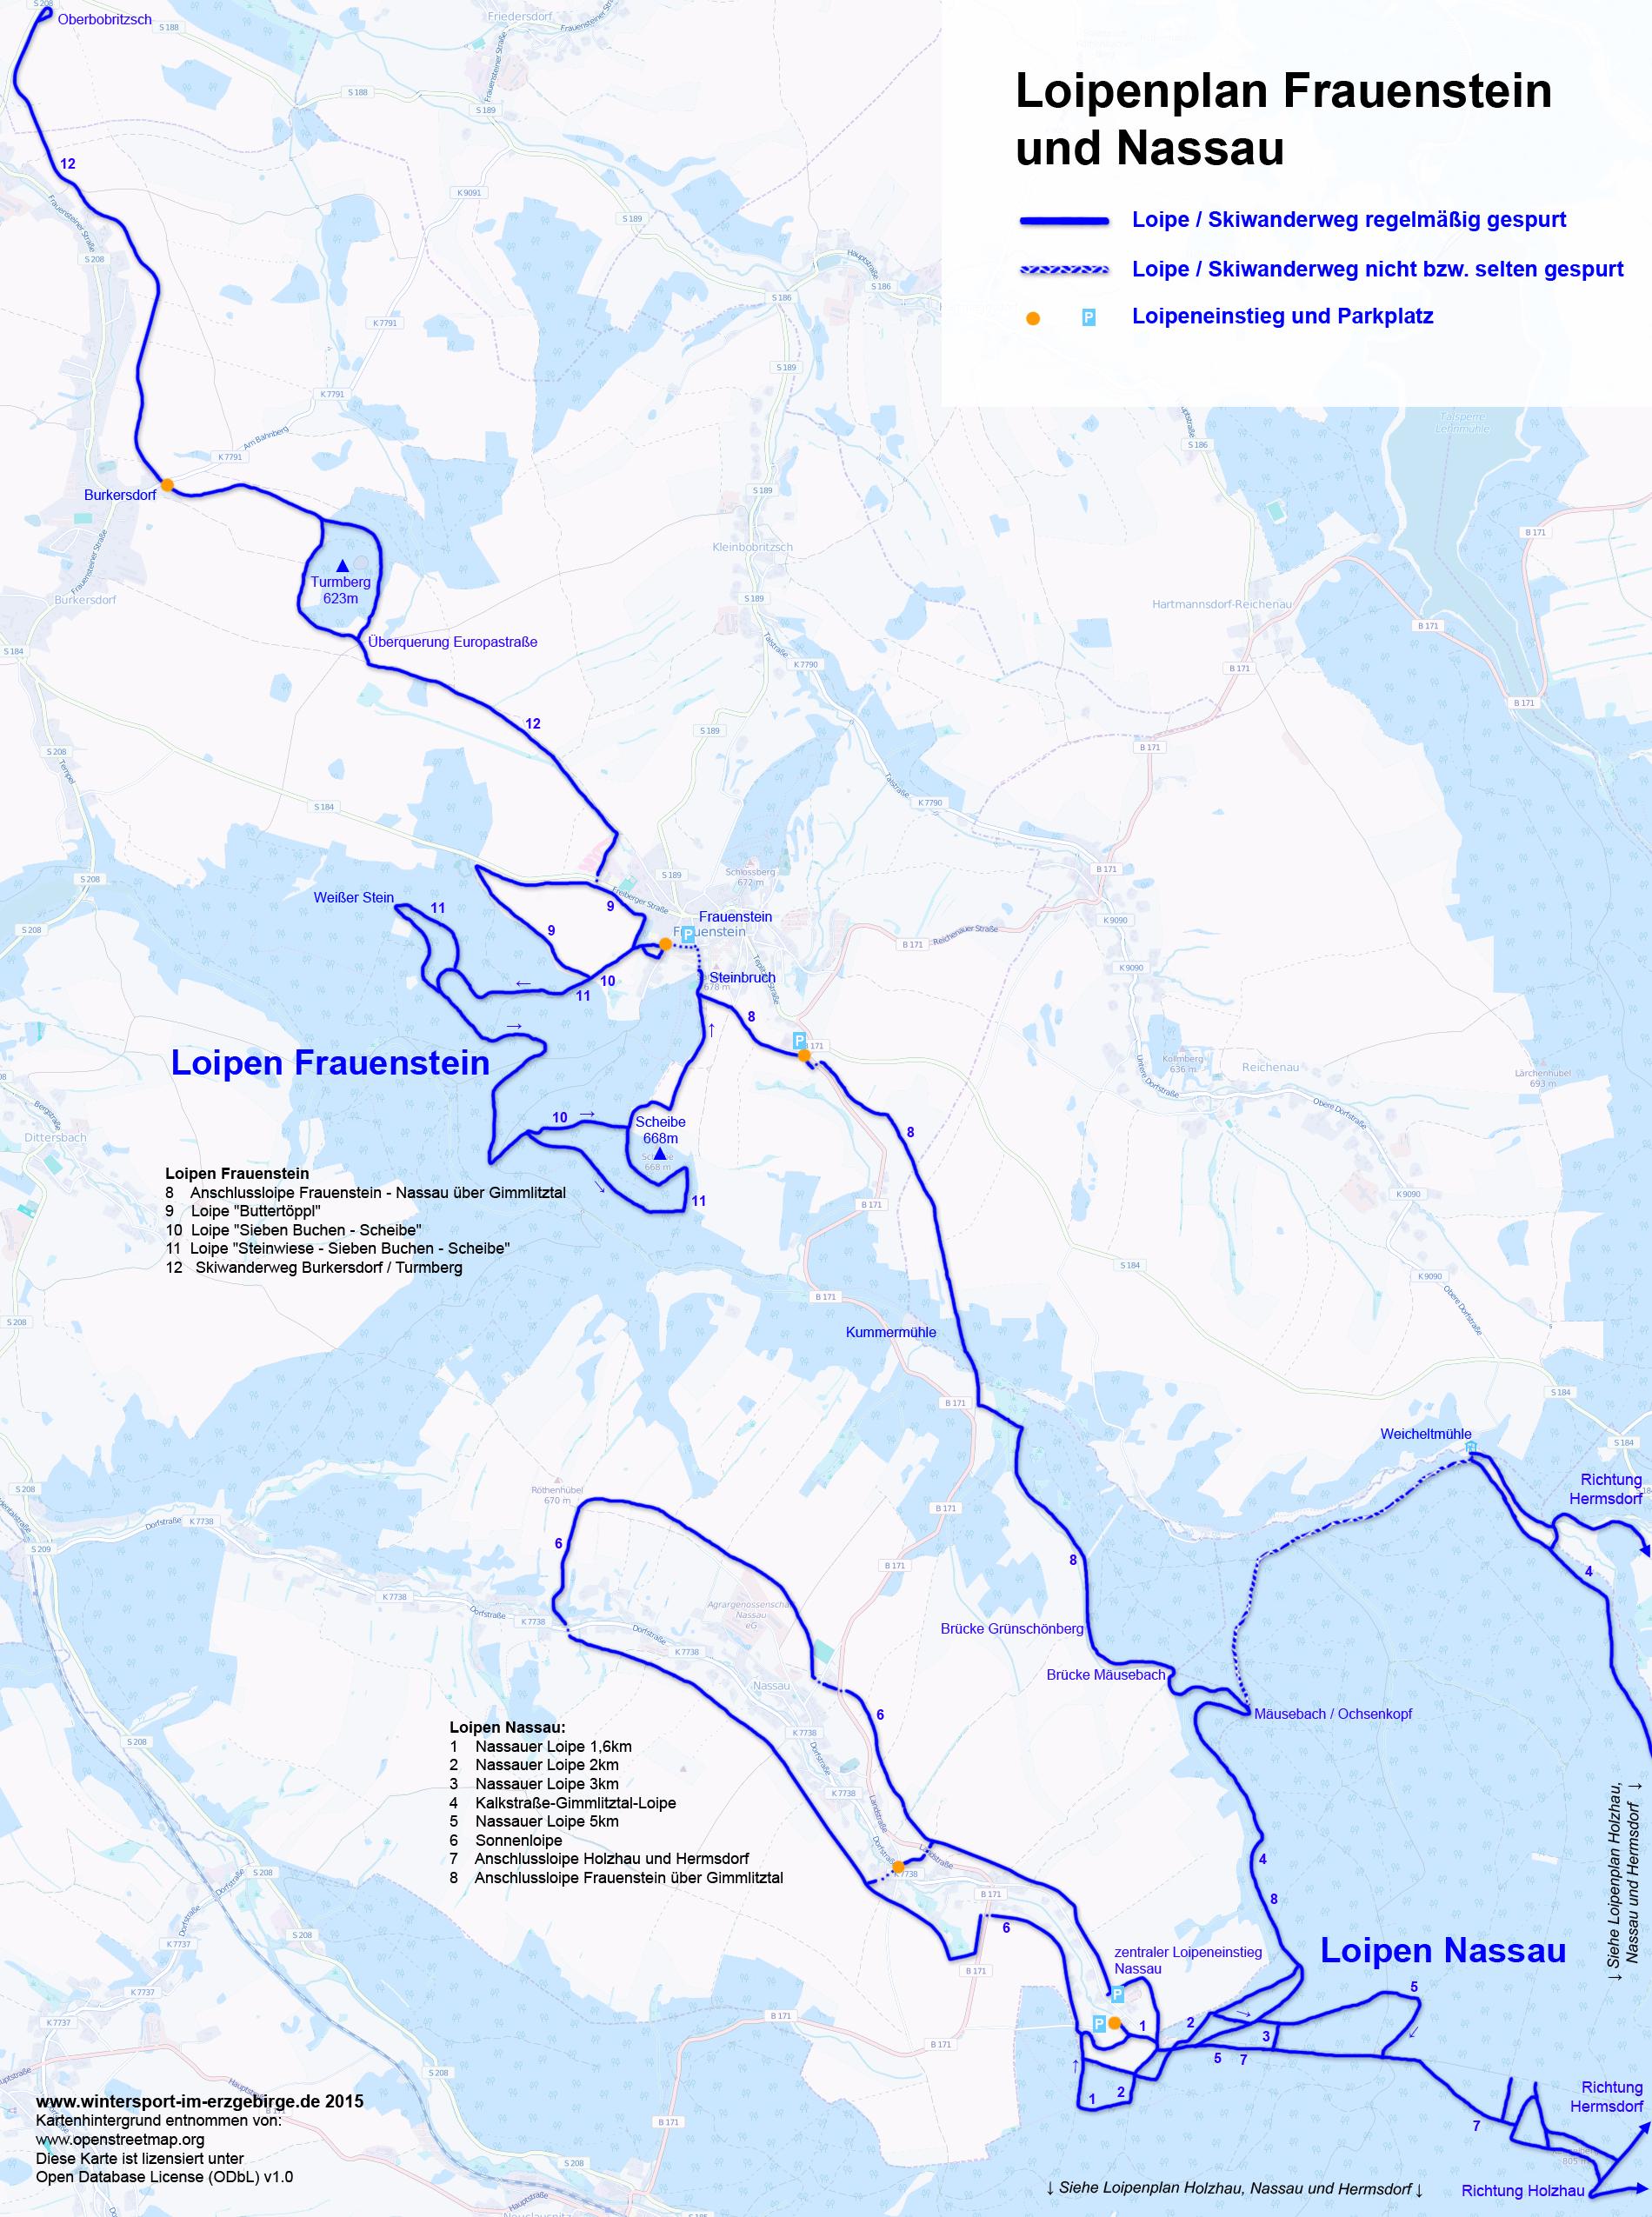 Loipenplan_Frauenstein